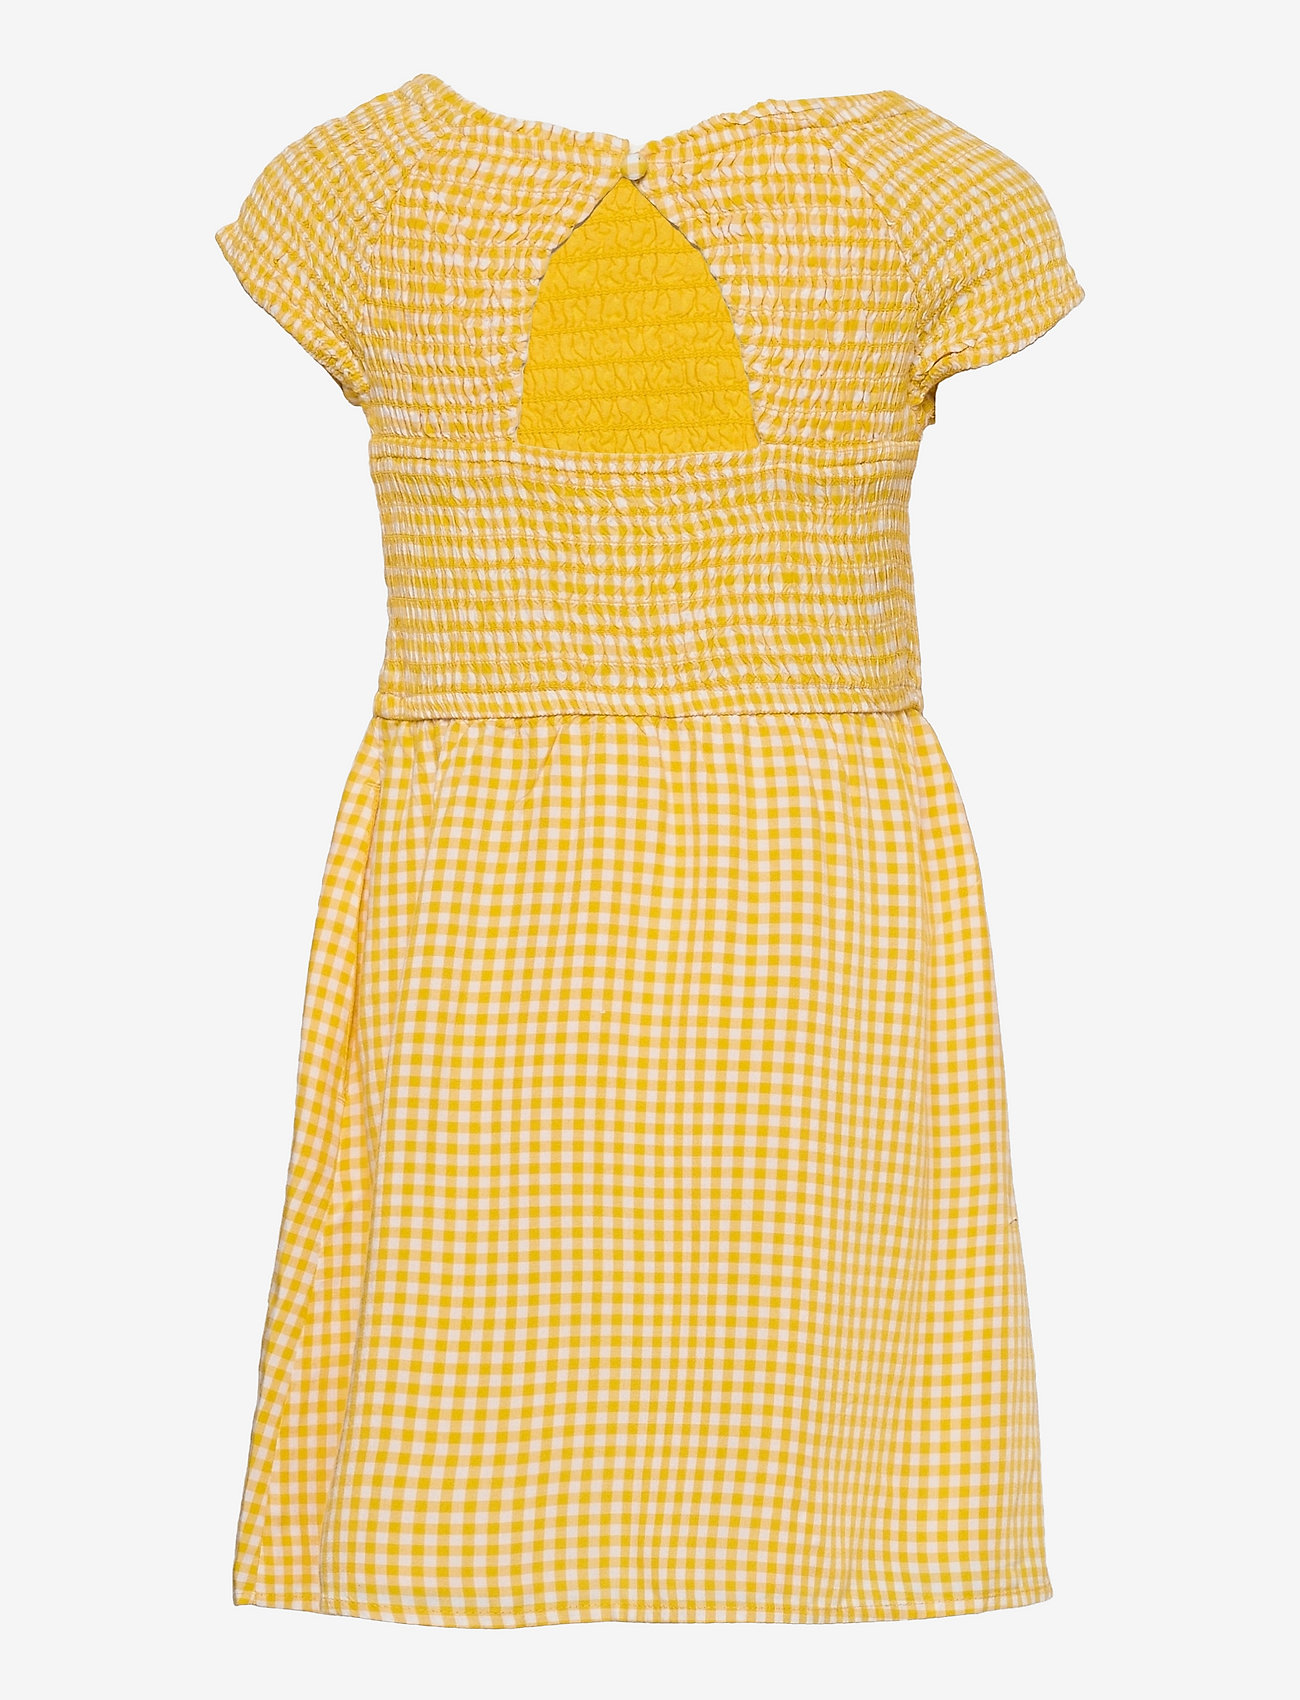 Abercrombie & Fitch - kids GIRLS DRESSES - kleider - light yellow patt - 1